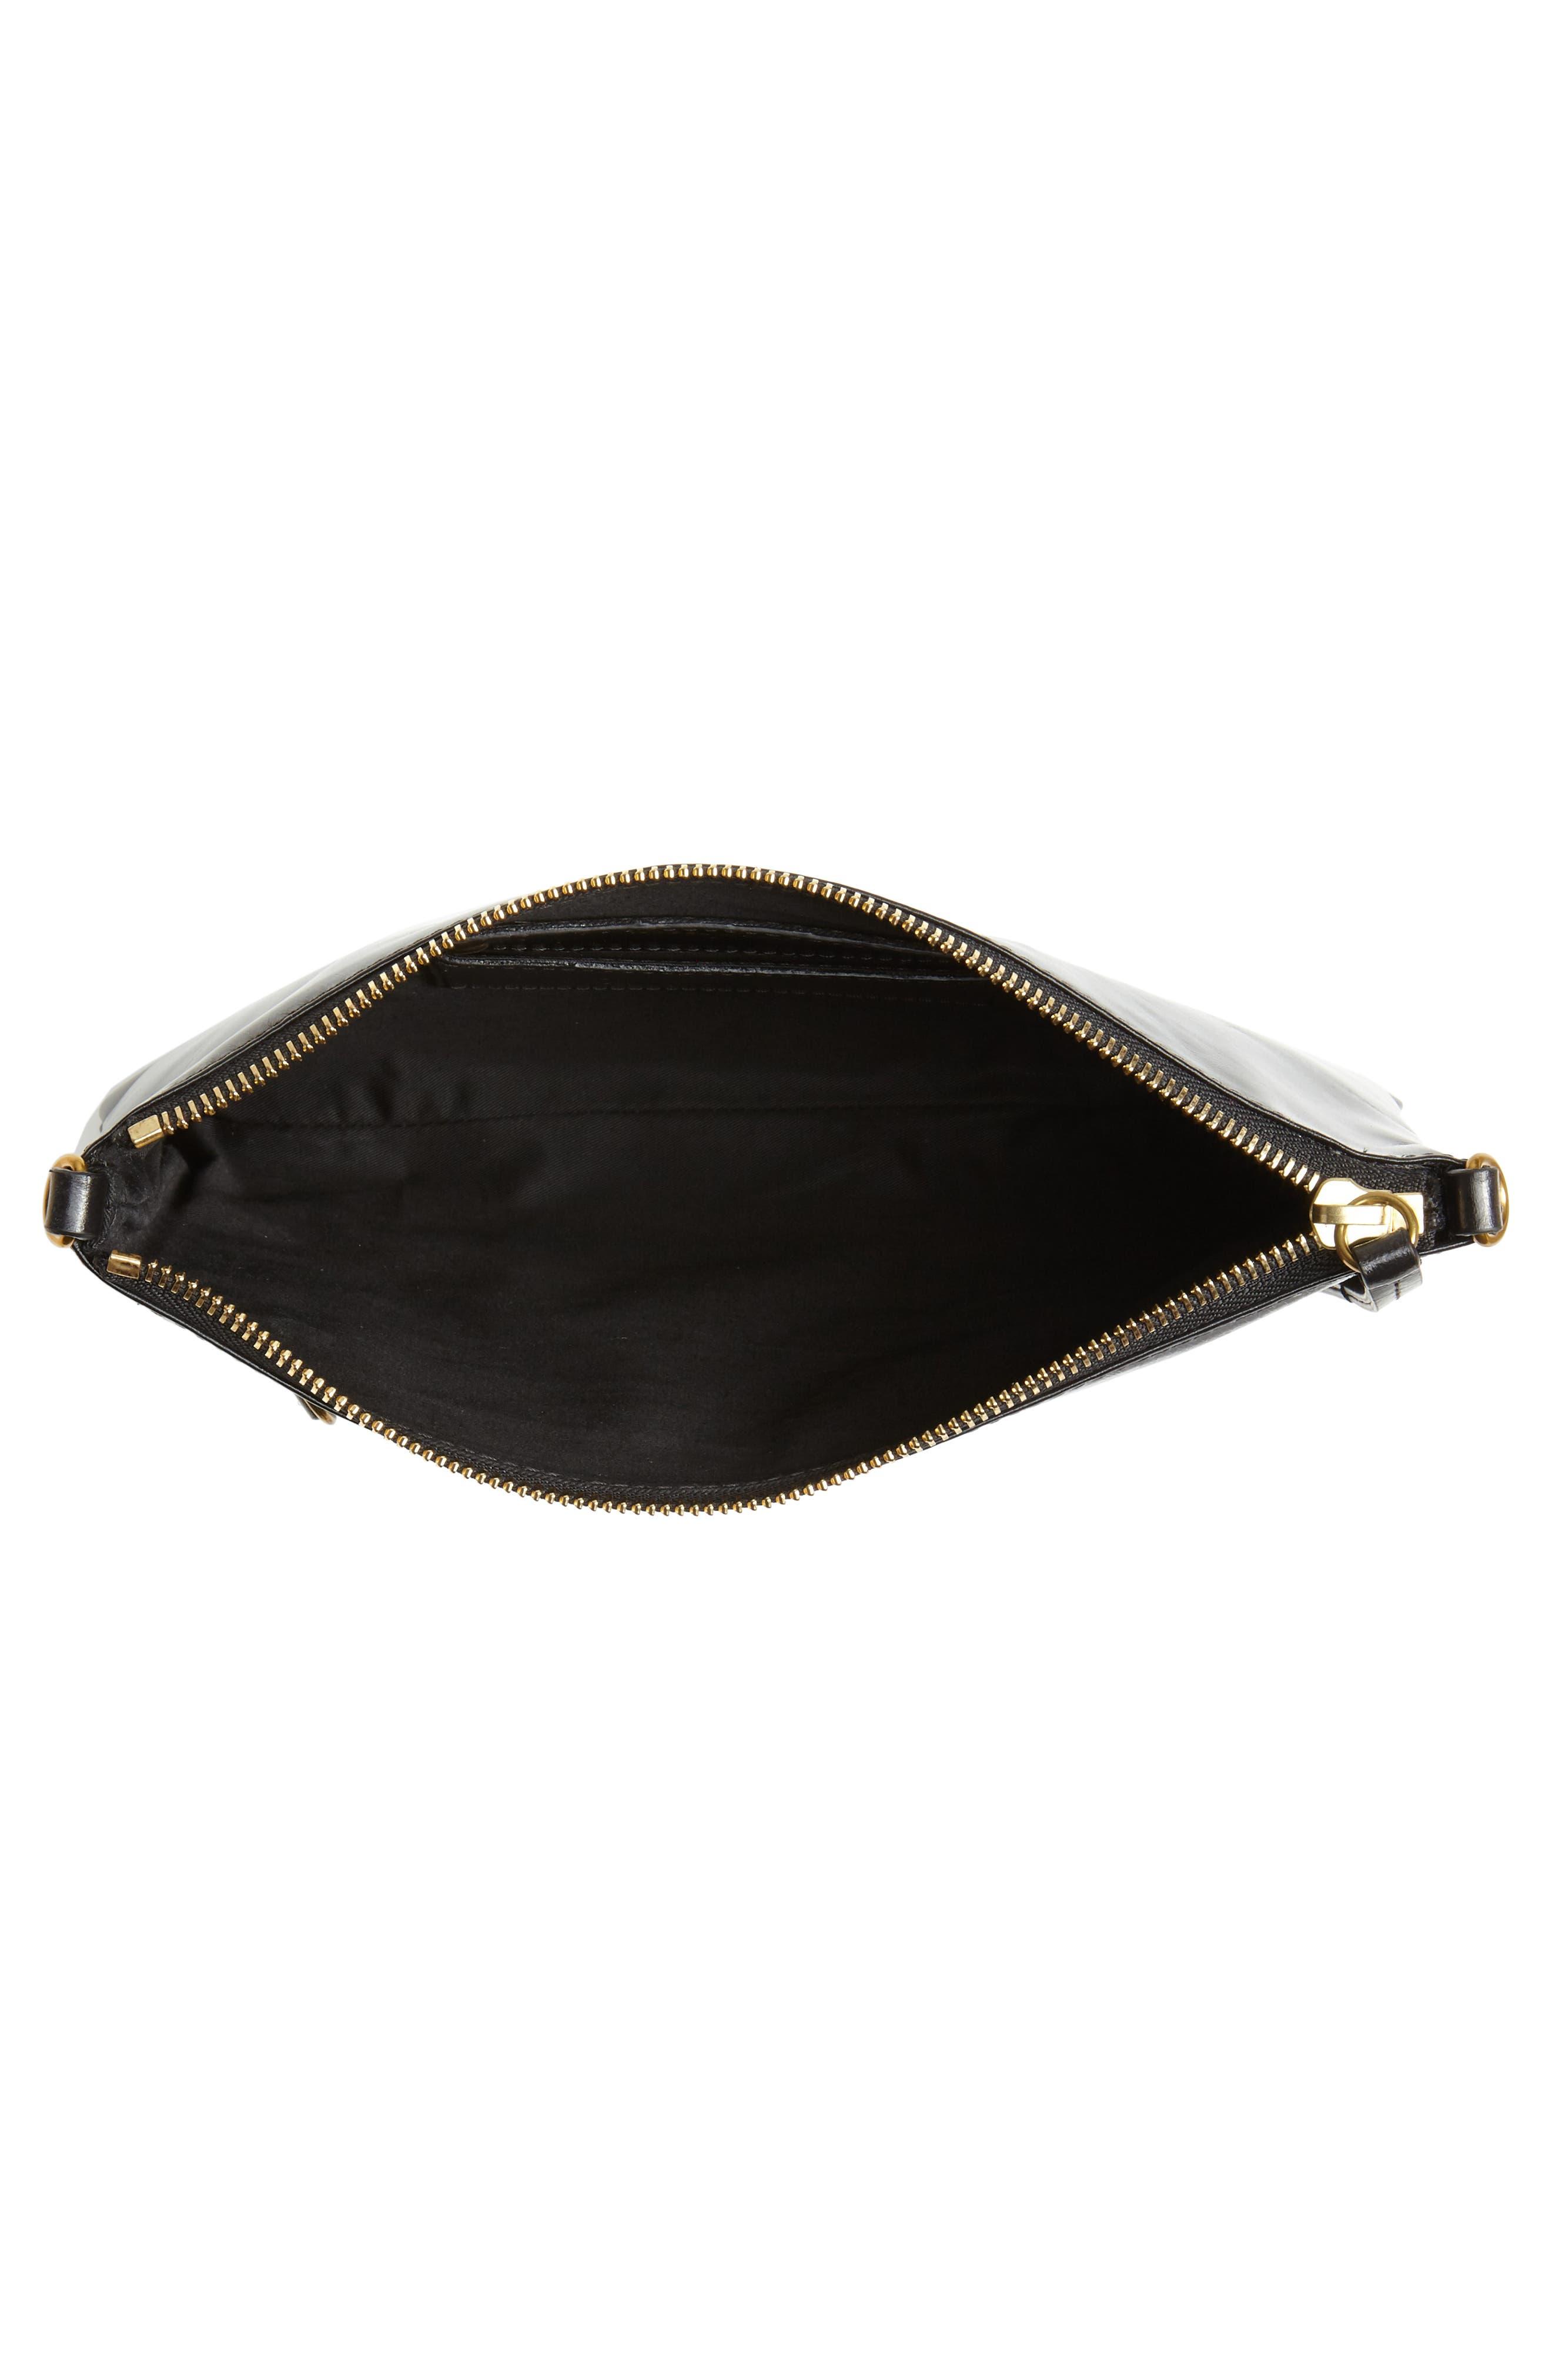 Nessah Leather Crossbody Bag,                             Alternate thumbnail 4, color,                             BLACK